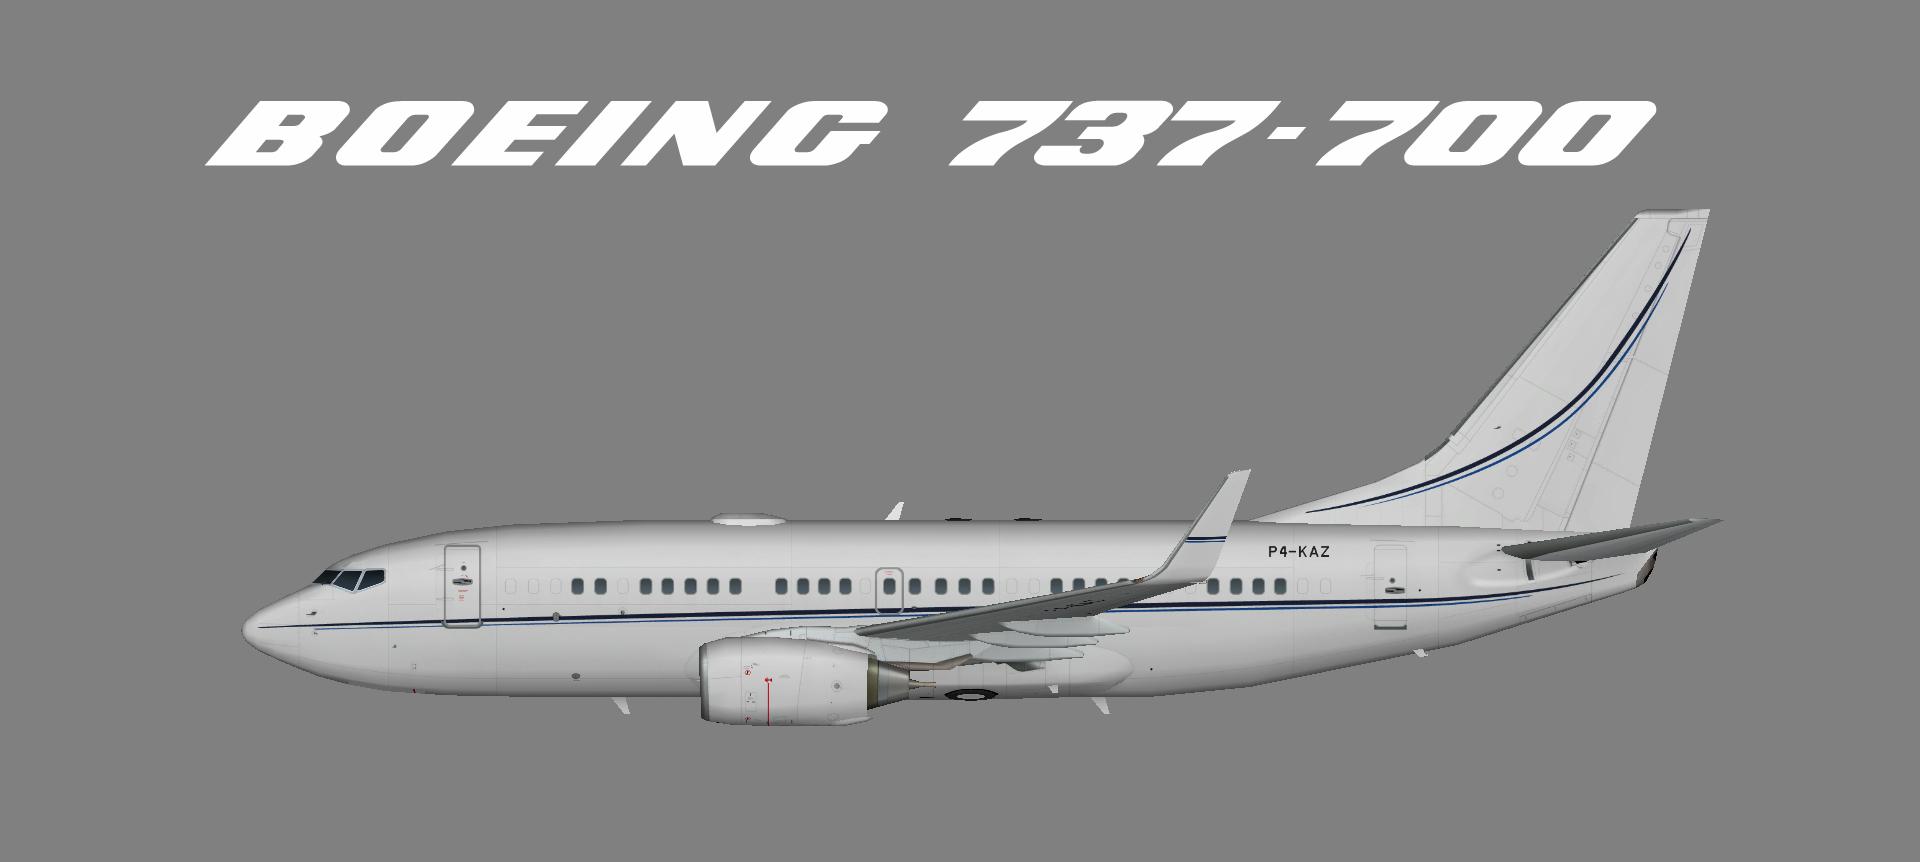 Kazakhstan Government 737-700